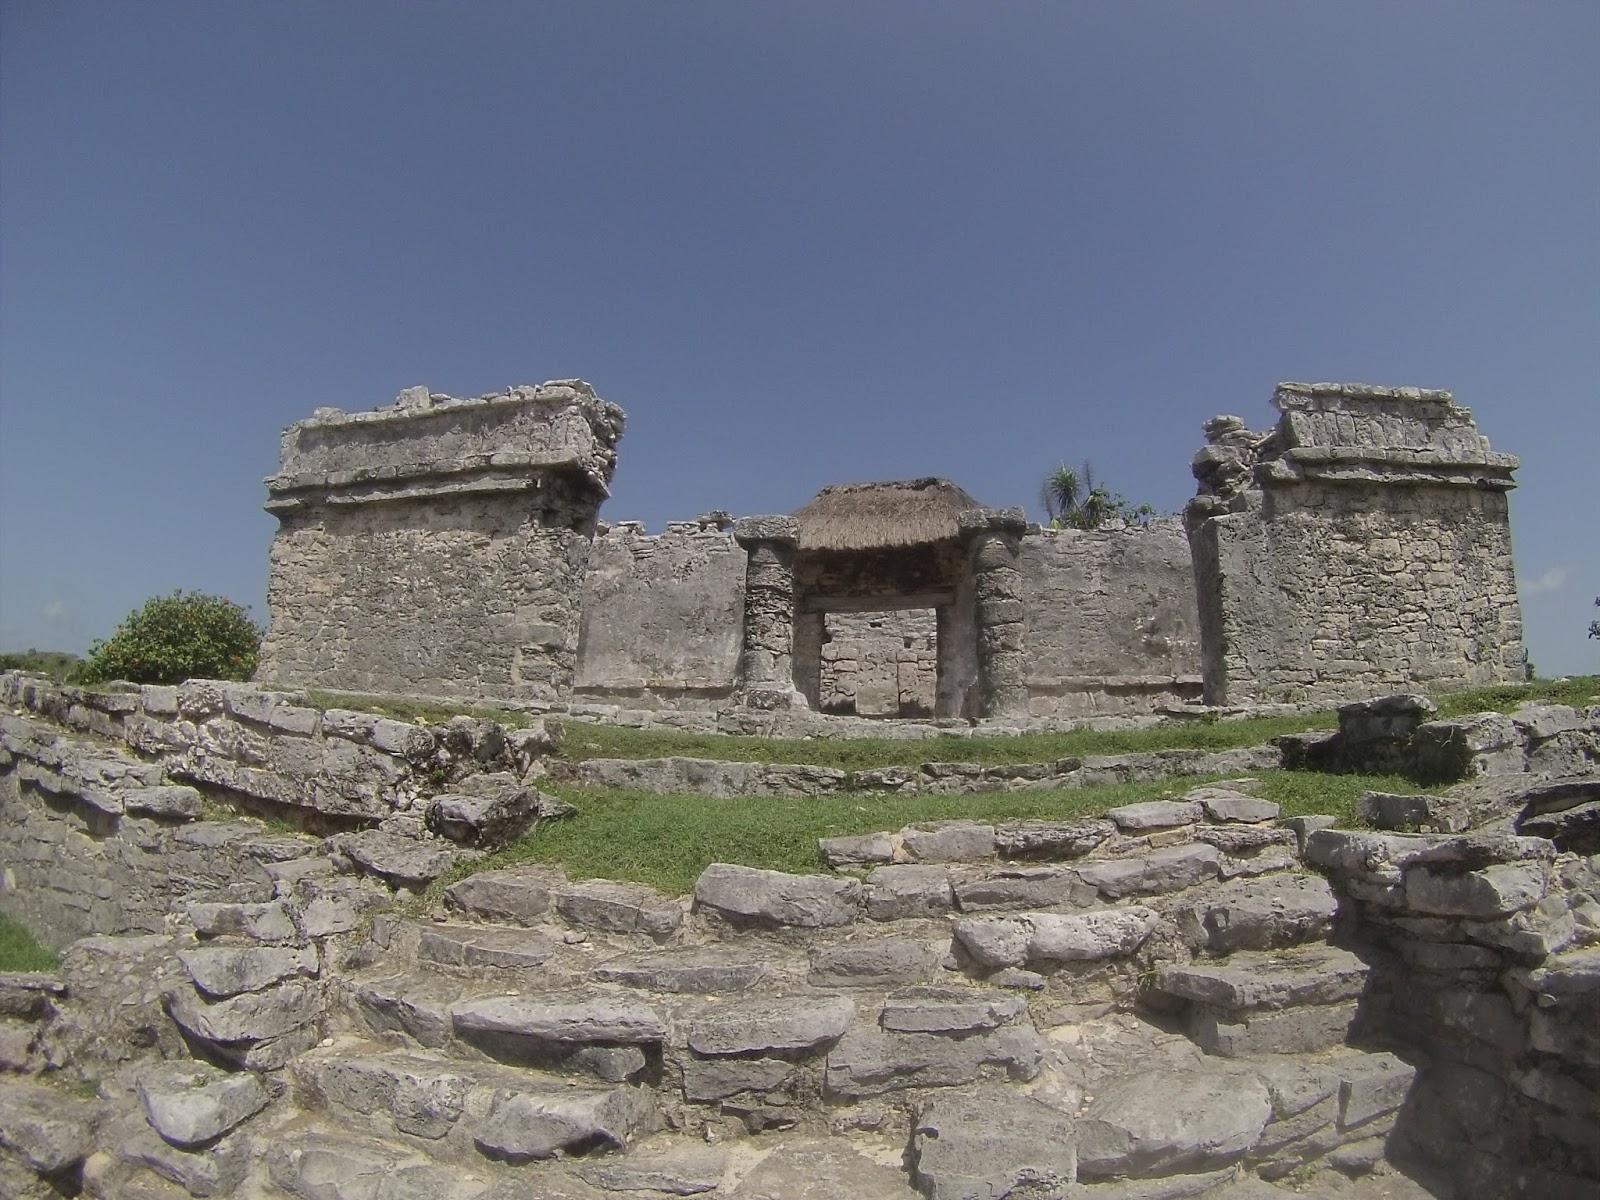 mayan, ruins, travel, bloggers, mexico, holiday, backpacking, adventure, history, trip,